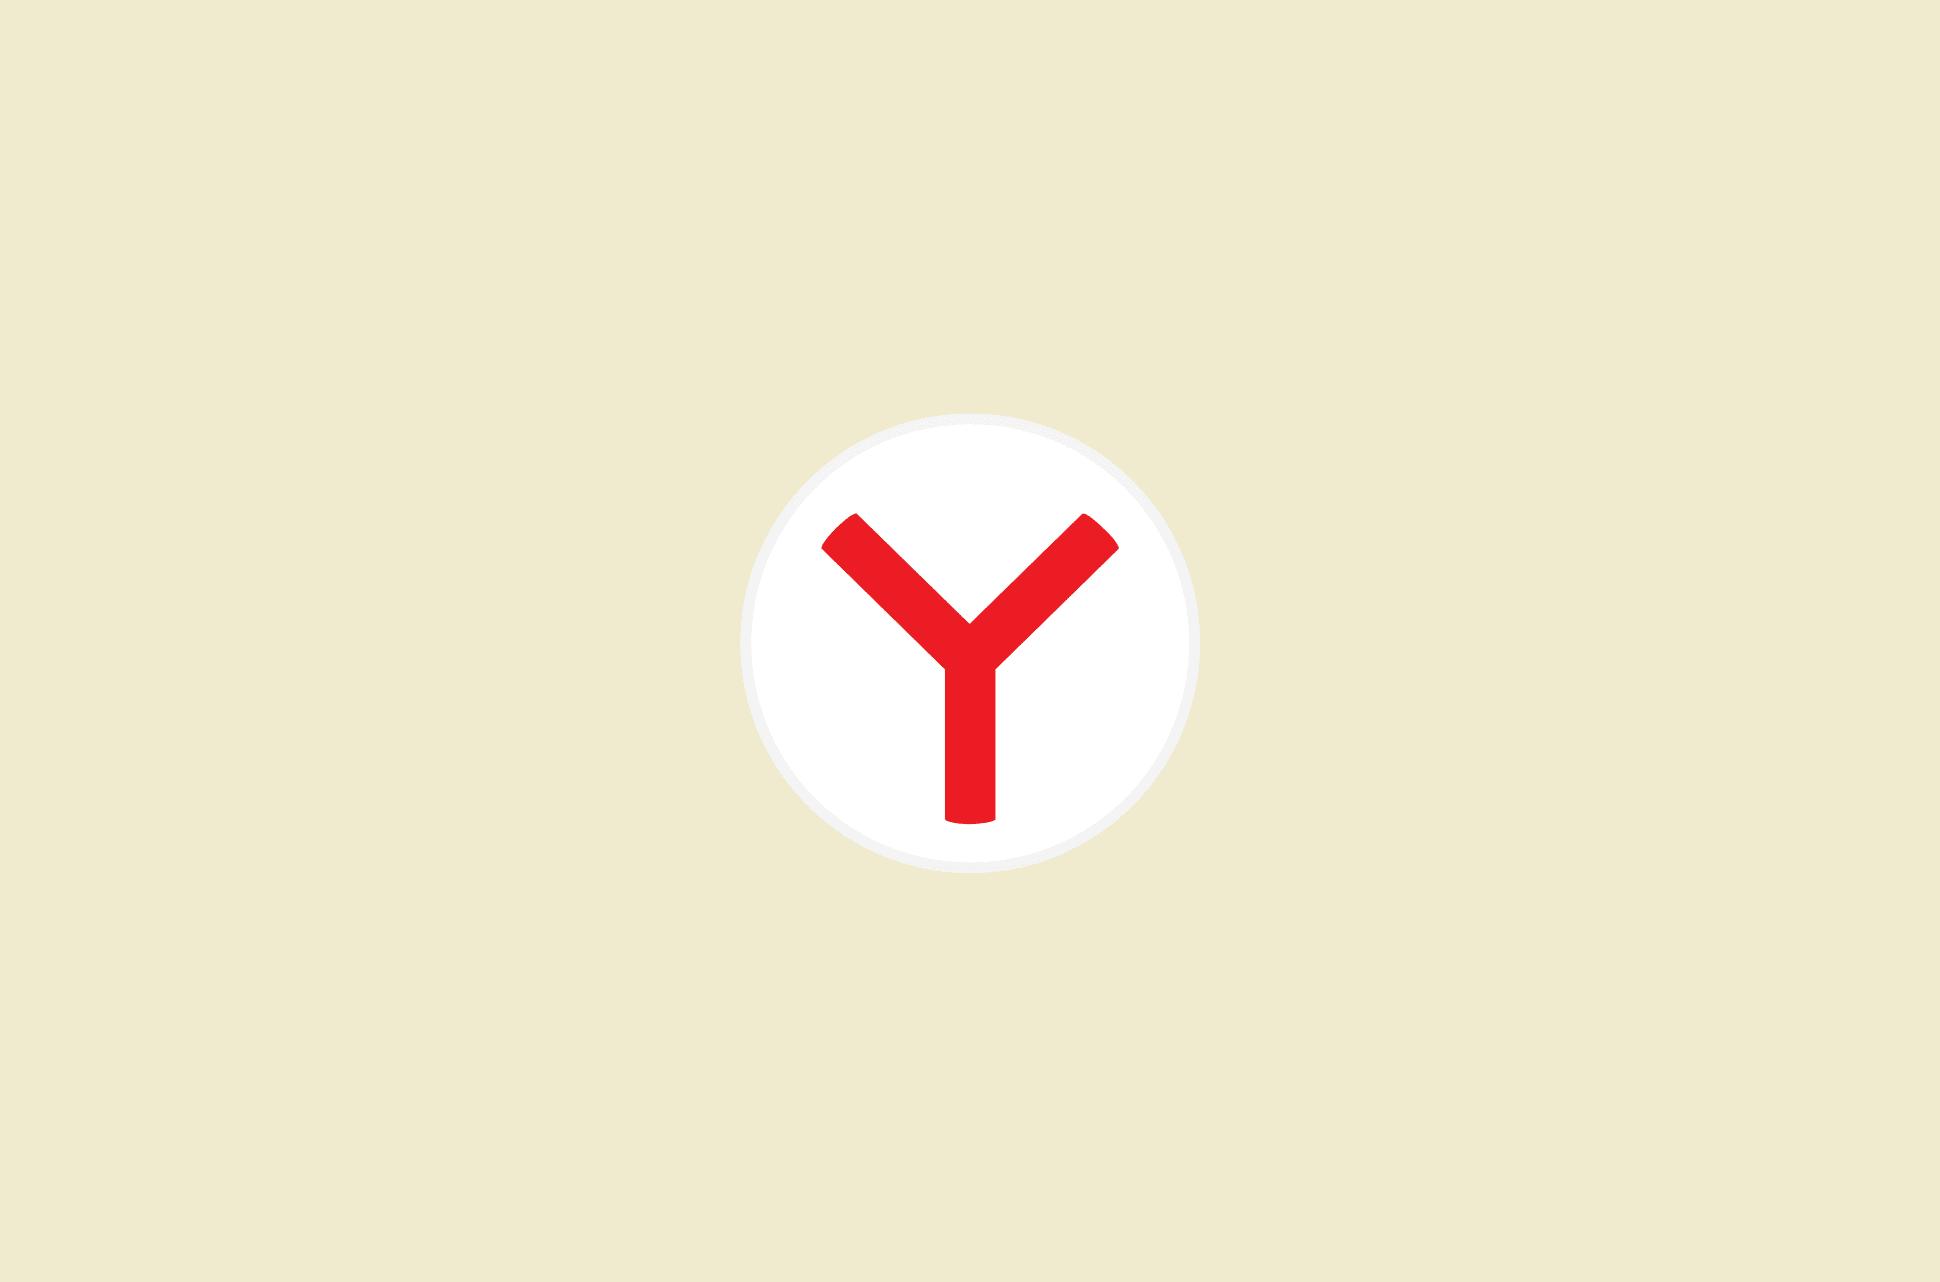 Yandex Browser logo.